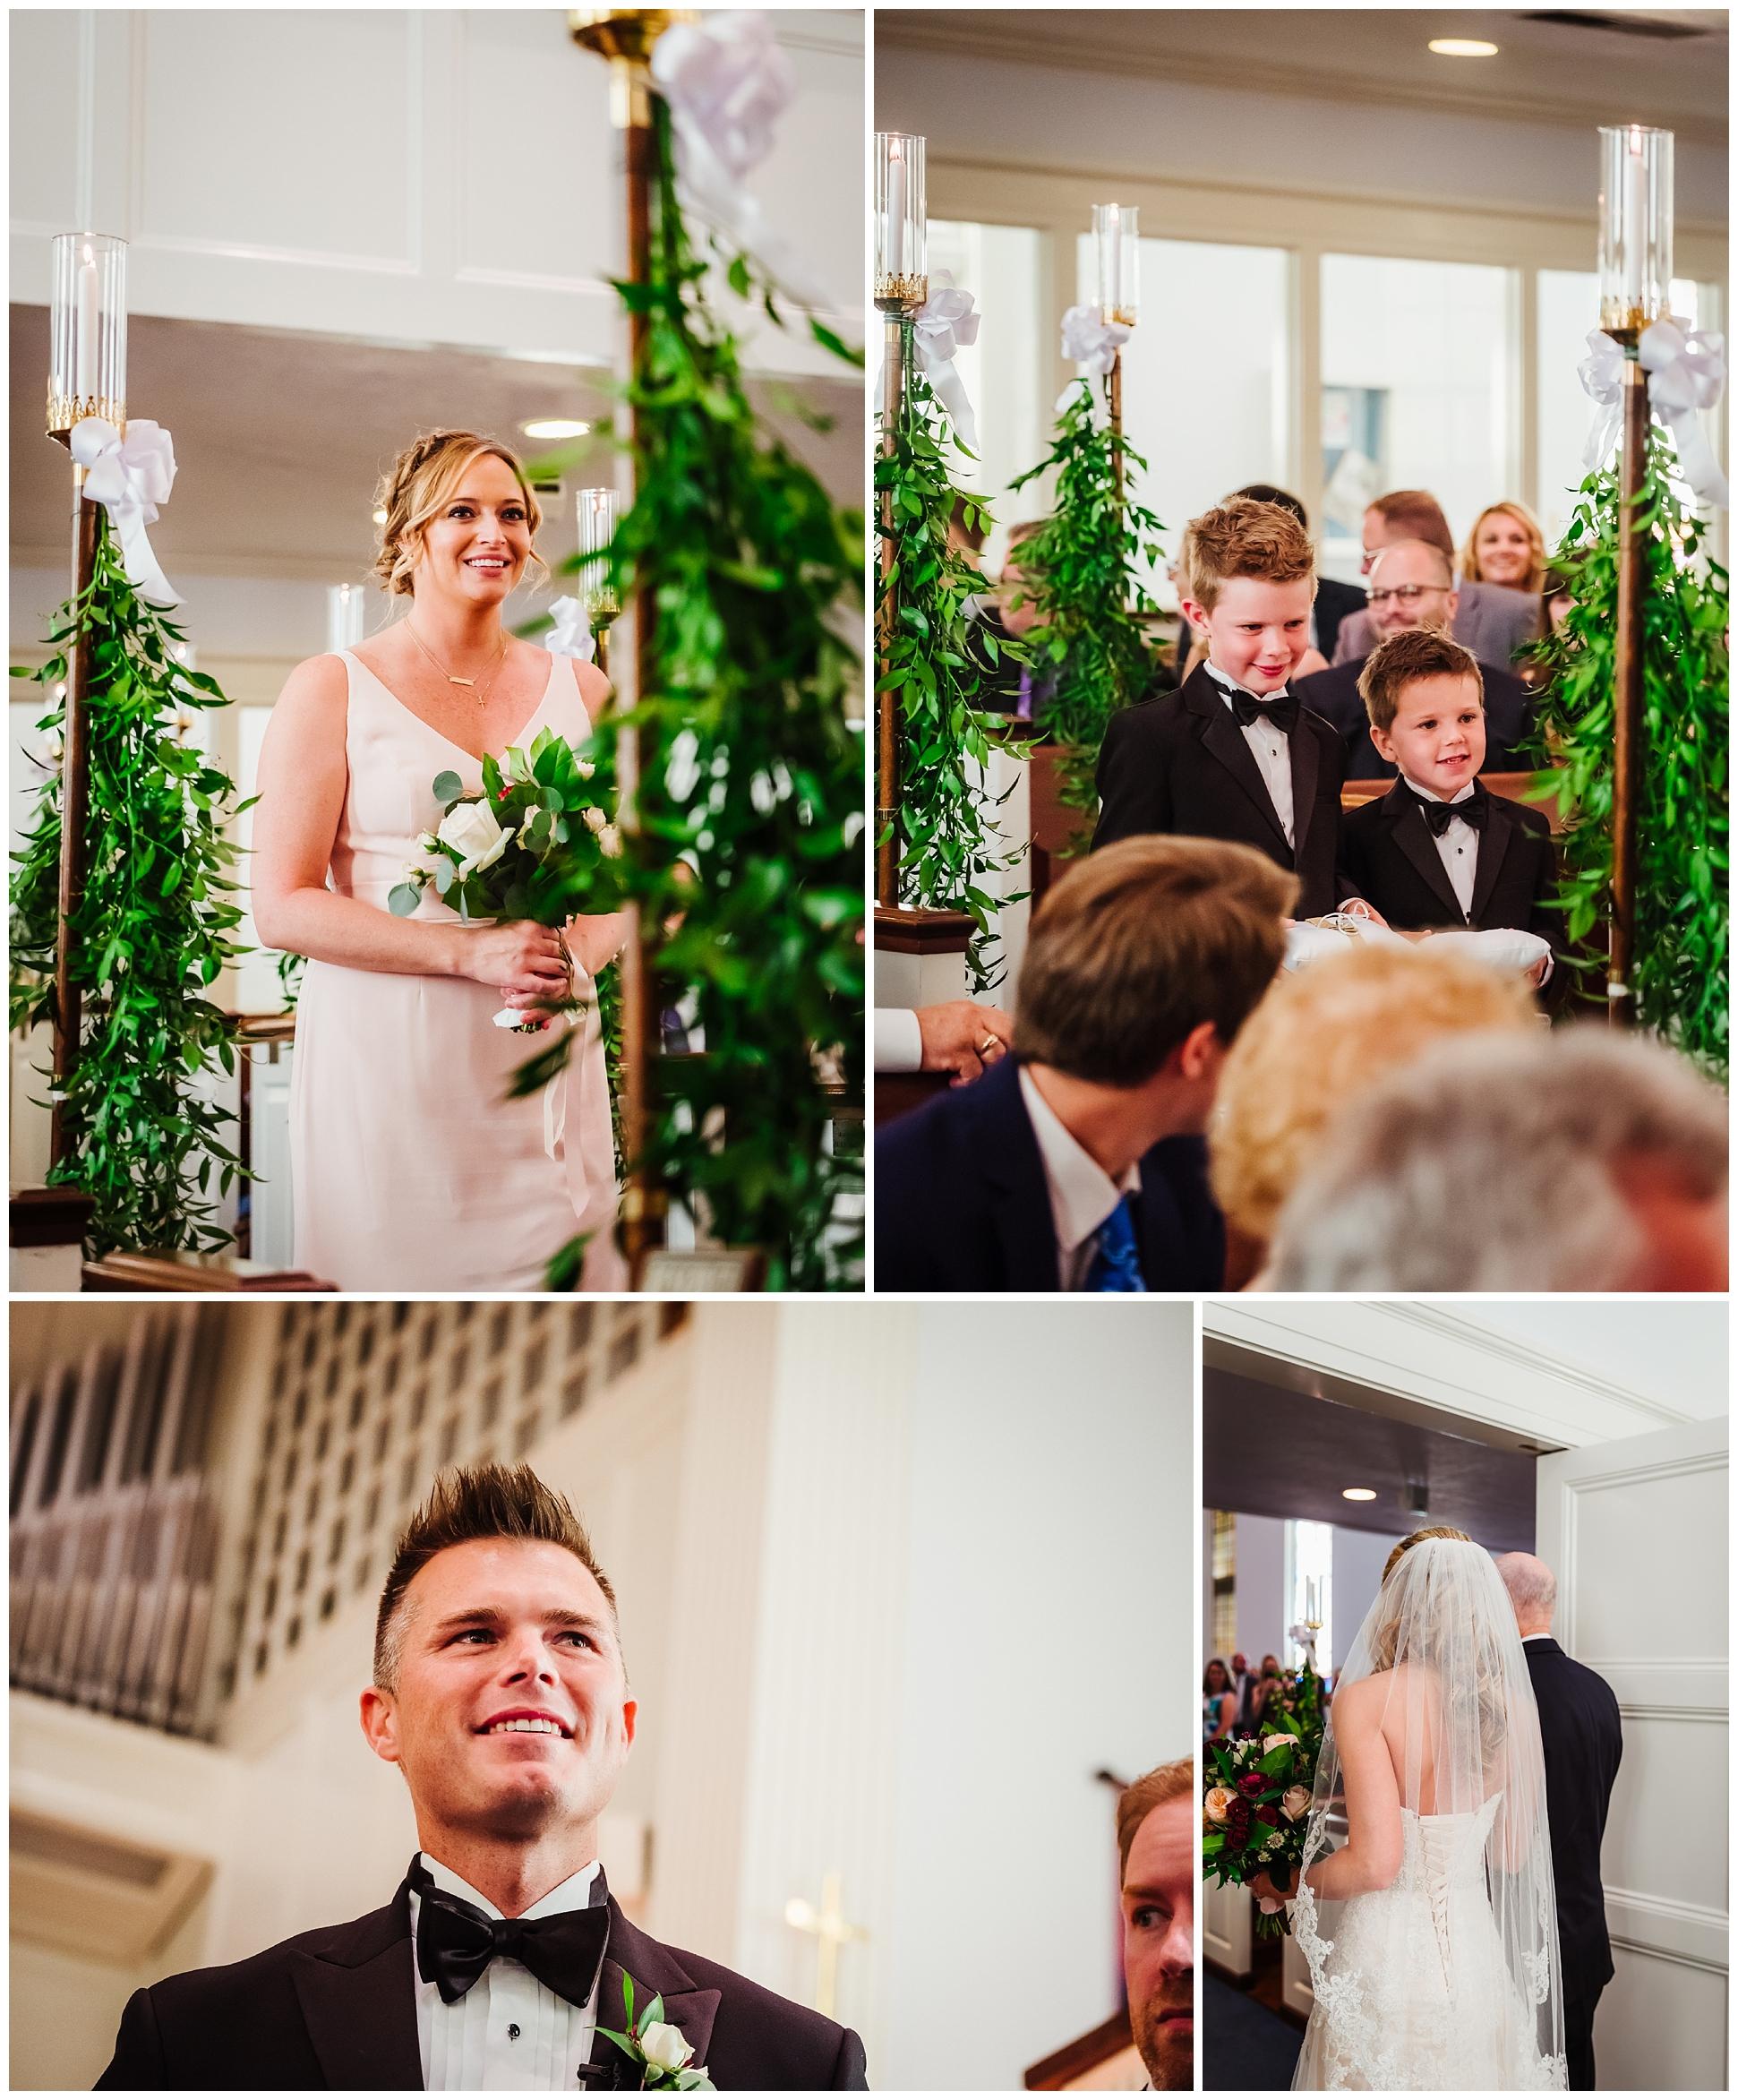 tampa-bradenton-wedding-photographer-south-florida-museum-classic-blush-gold-alpacas-sparklers_0045.jpg